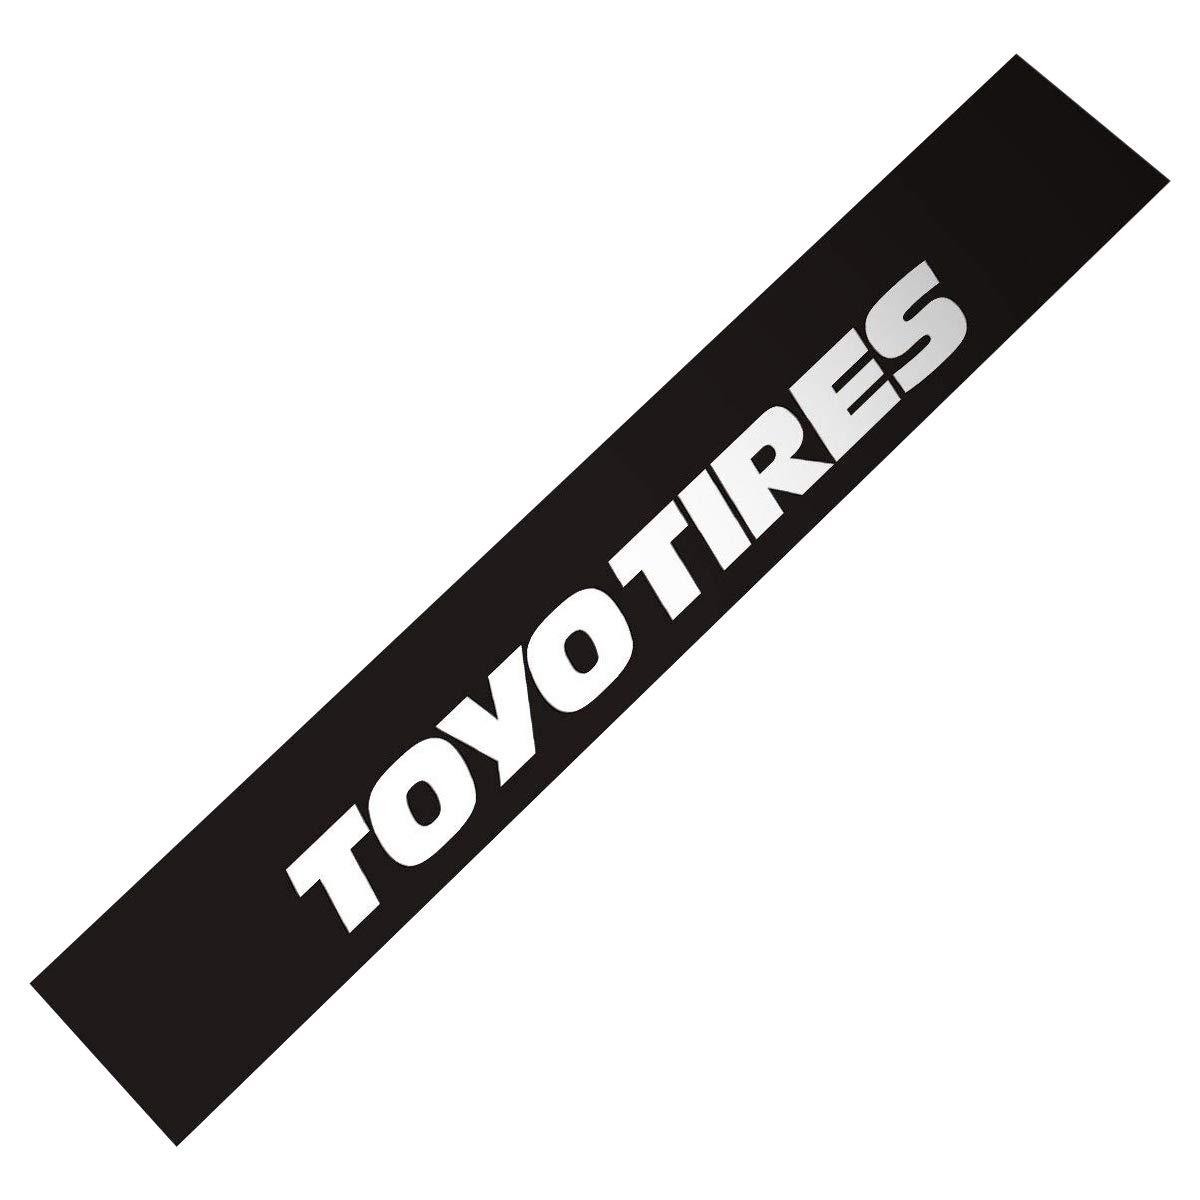 Demupaiフロントフロントガラスのバナーデカールビニール車のステッカーToyo Tires 132cm*21cm ブラック DE-TOYO-TIBK